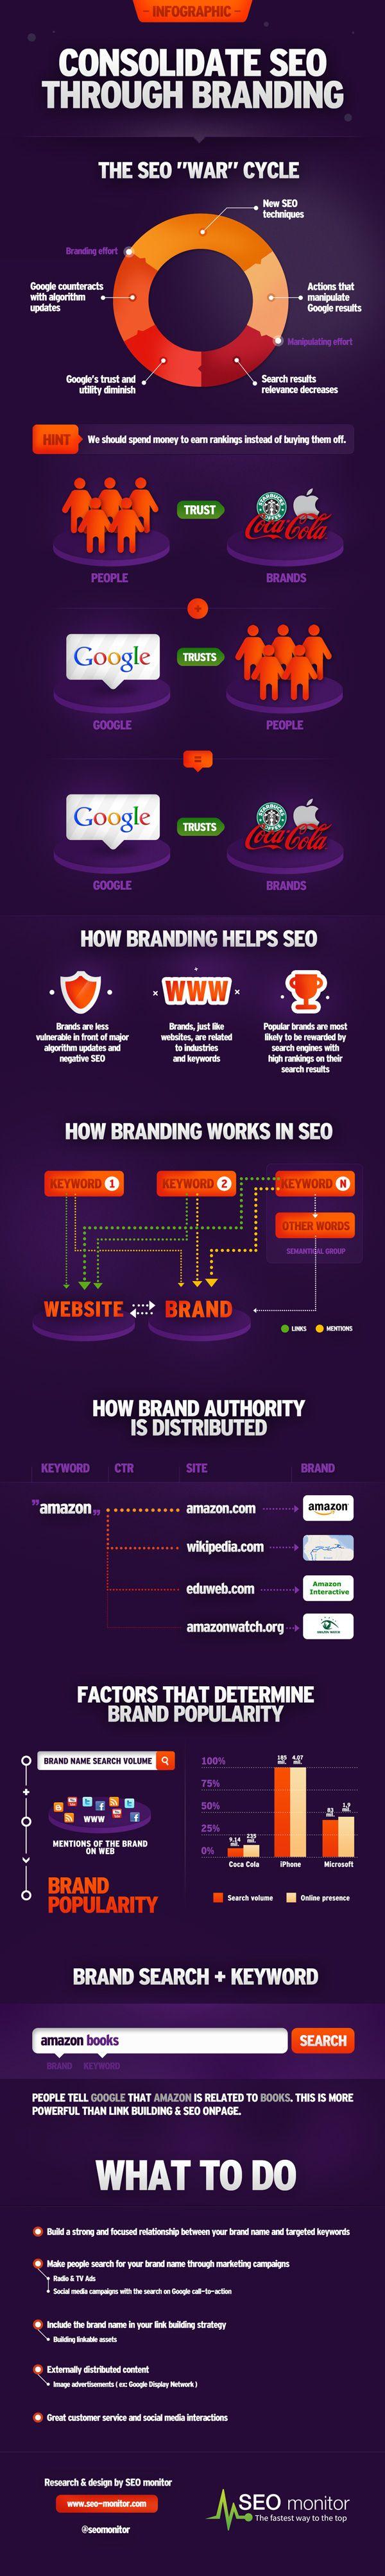 How Branding works in SEO